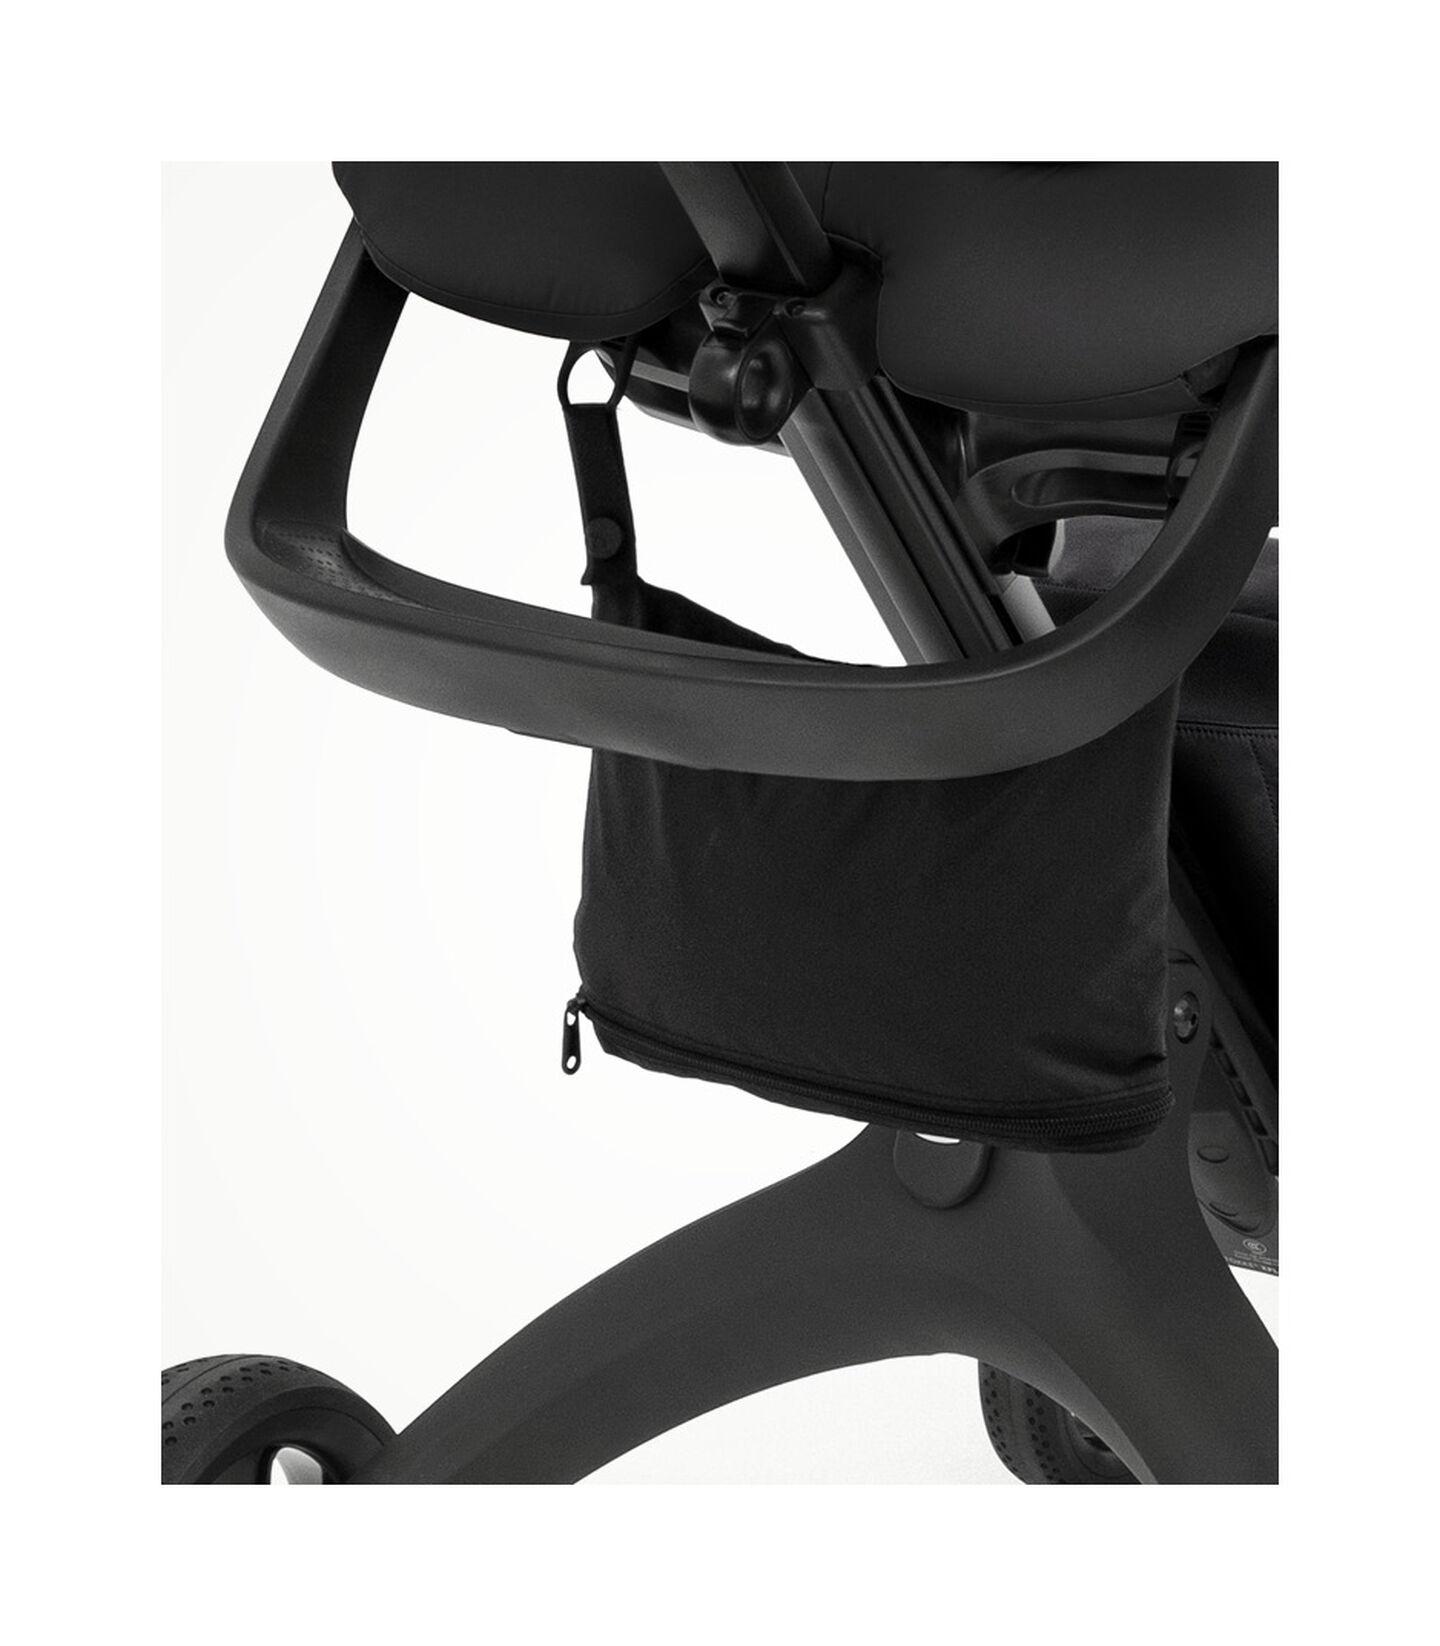 Stokke® Xplory® X Regenschutz Black, Black, mainview view 2